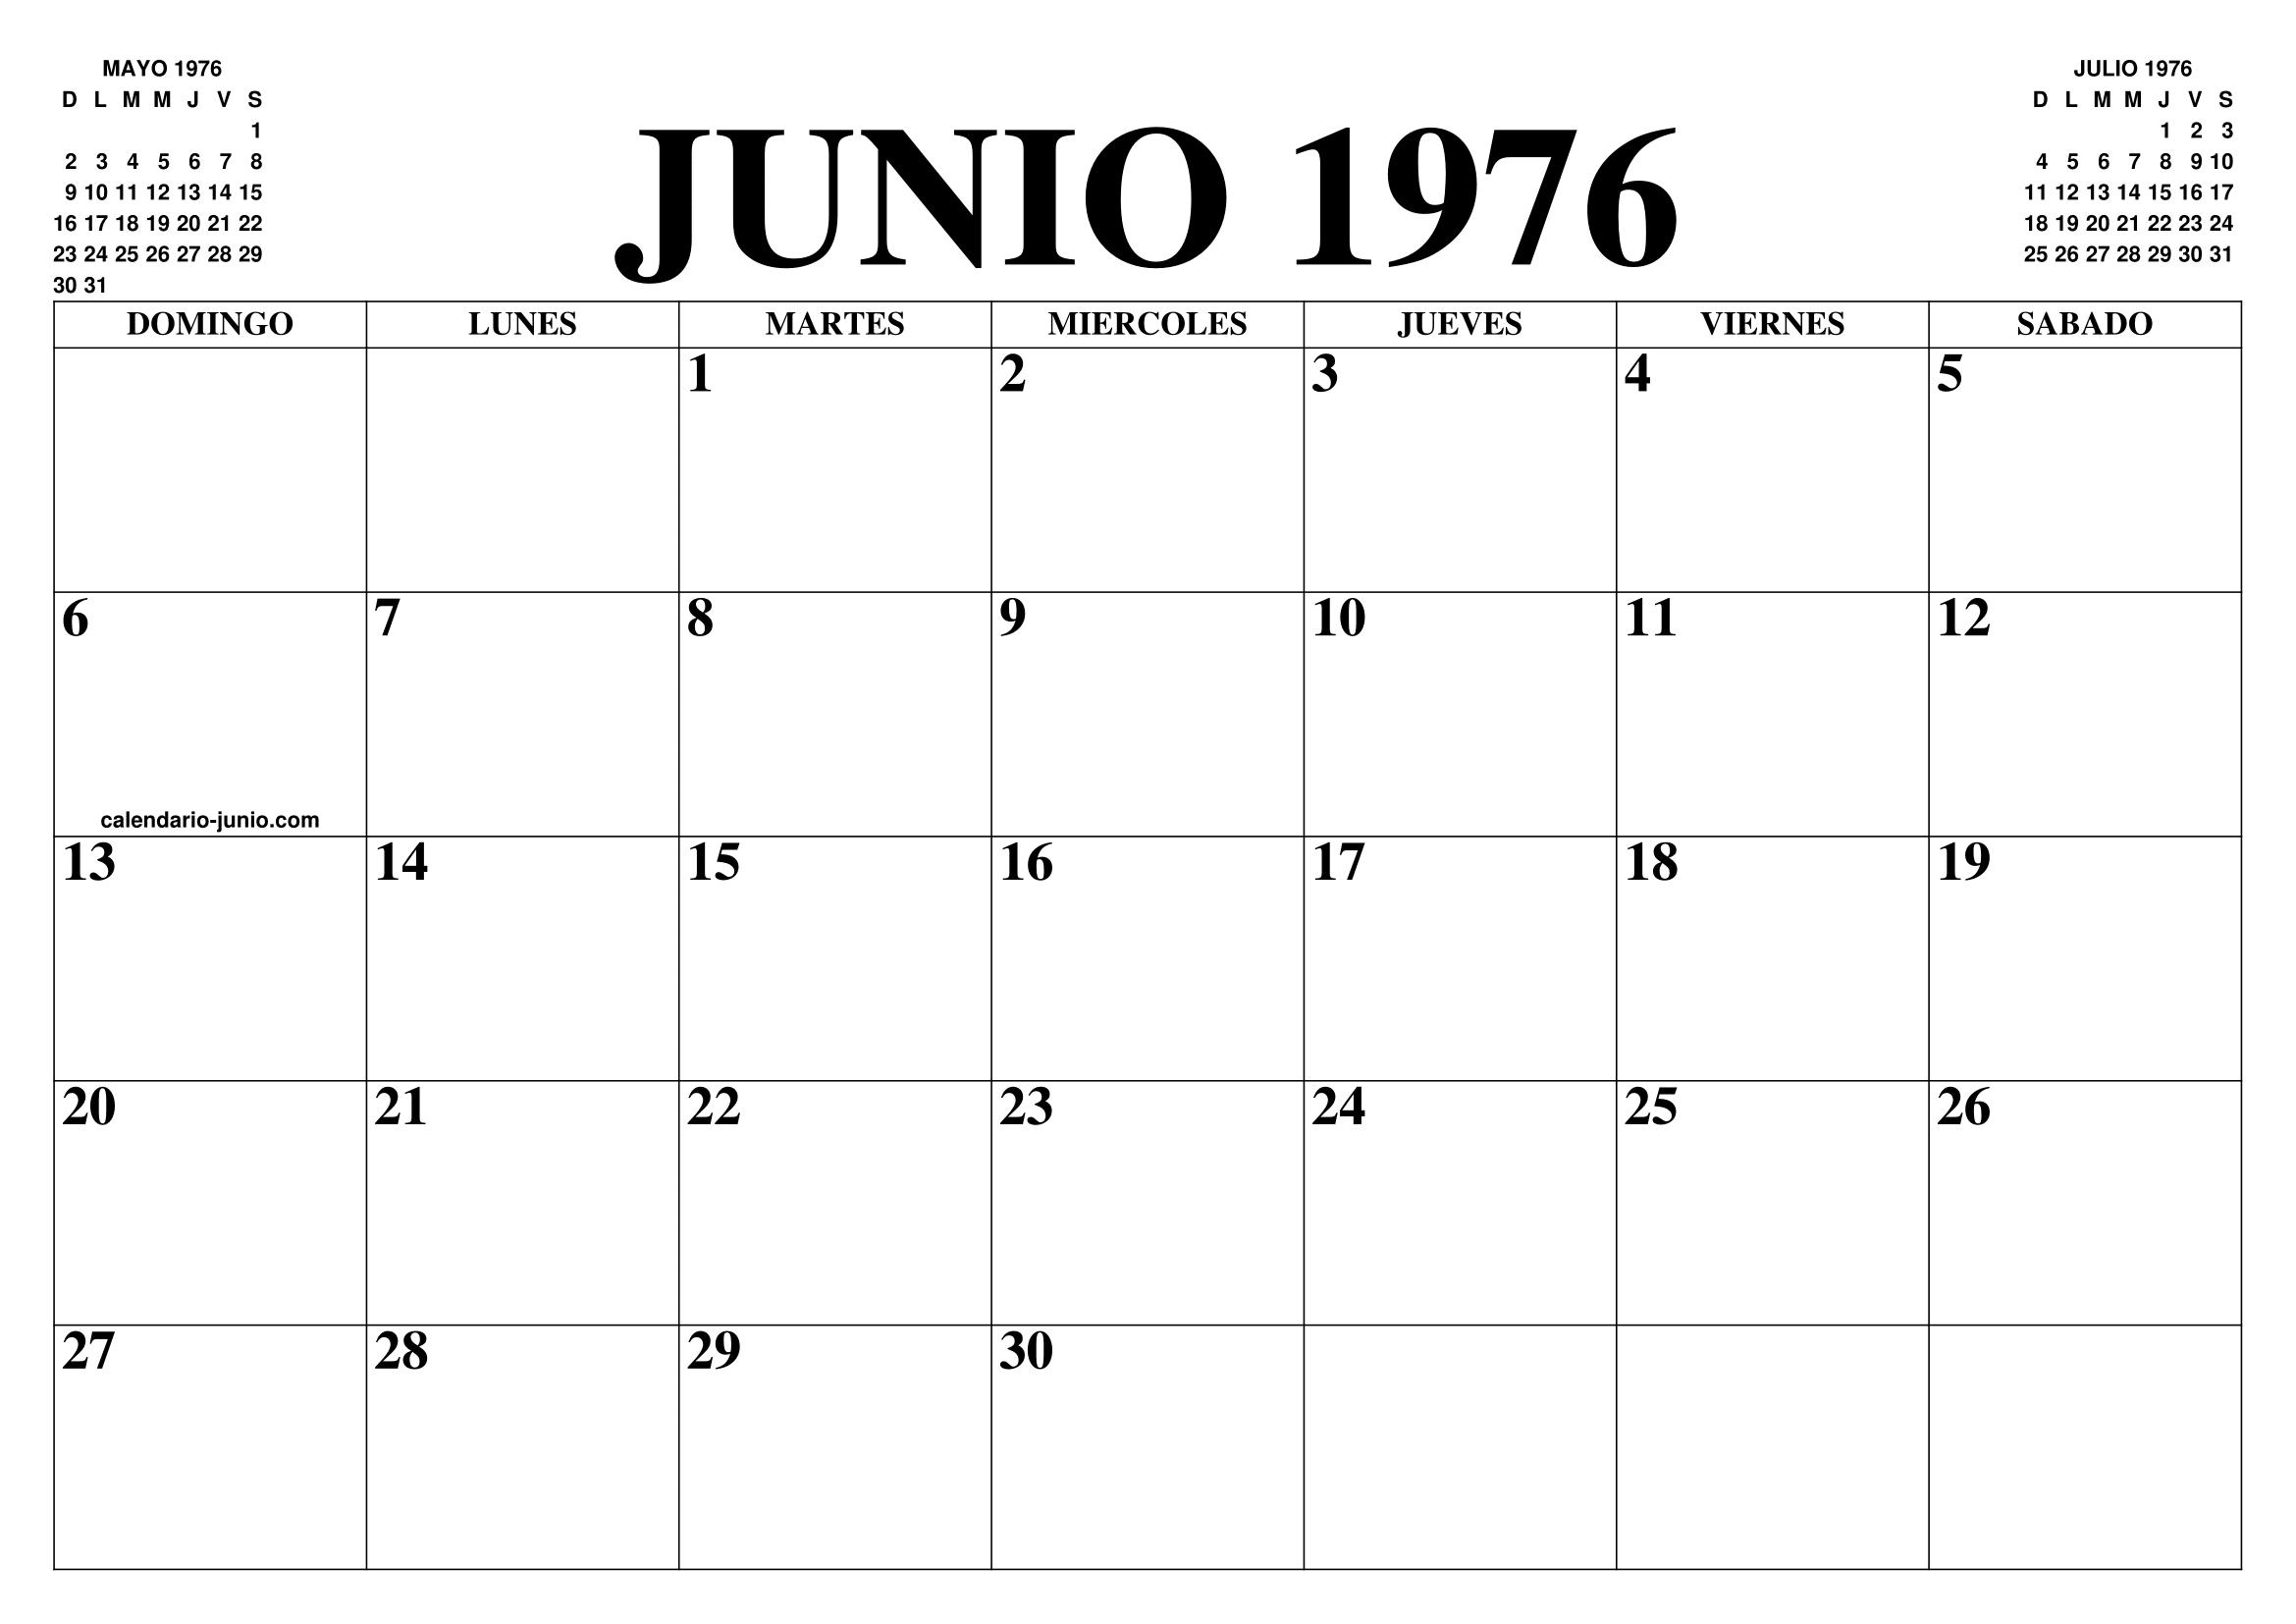 Calendario Julio 1976.Calendario Junio 1976 El Calendario Junio Para Imprimir